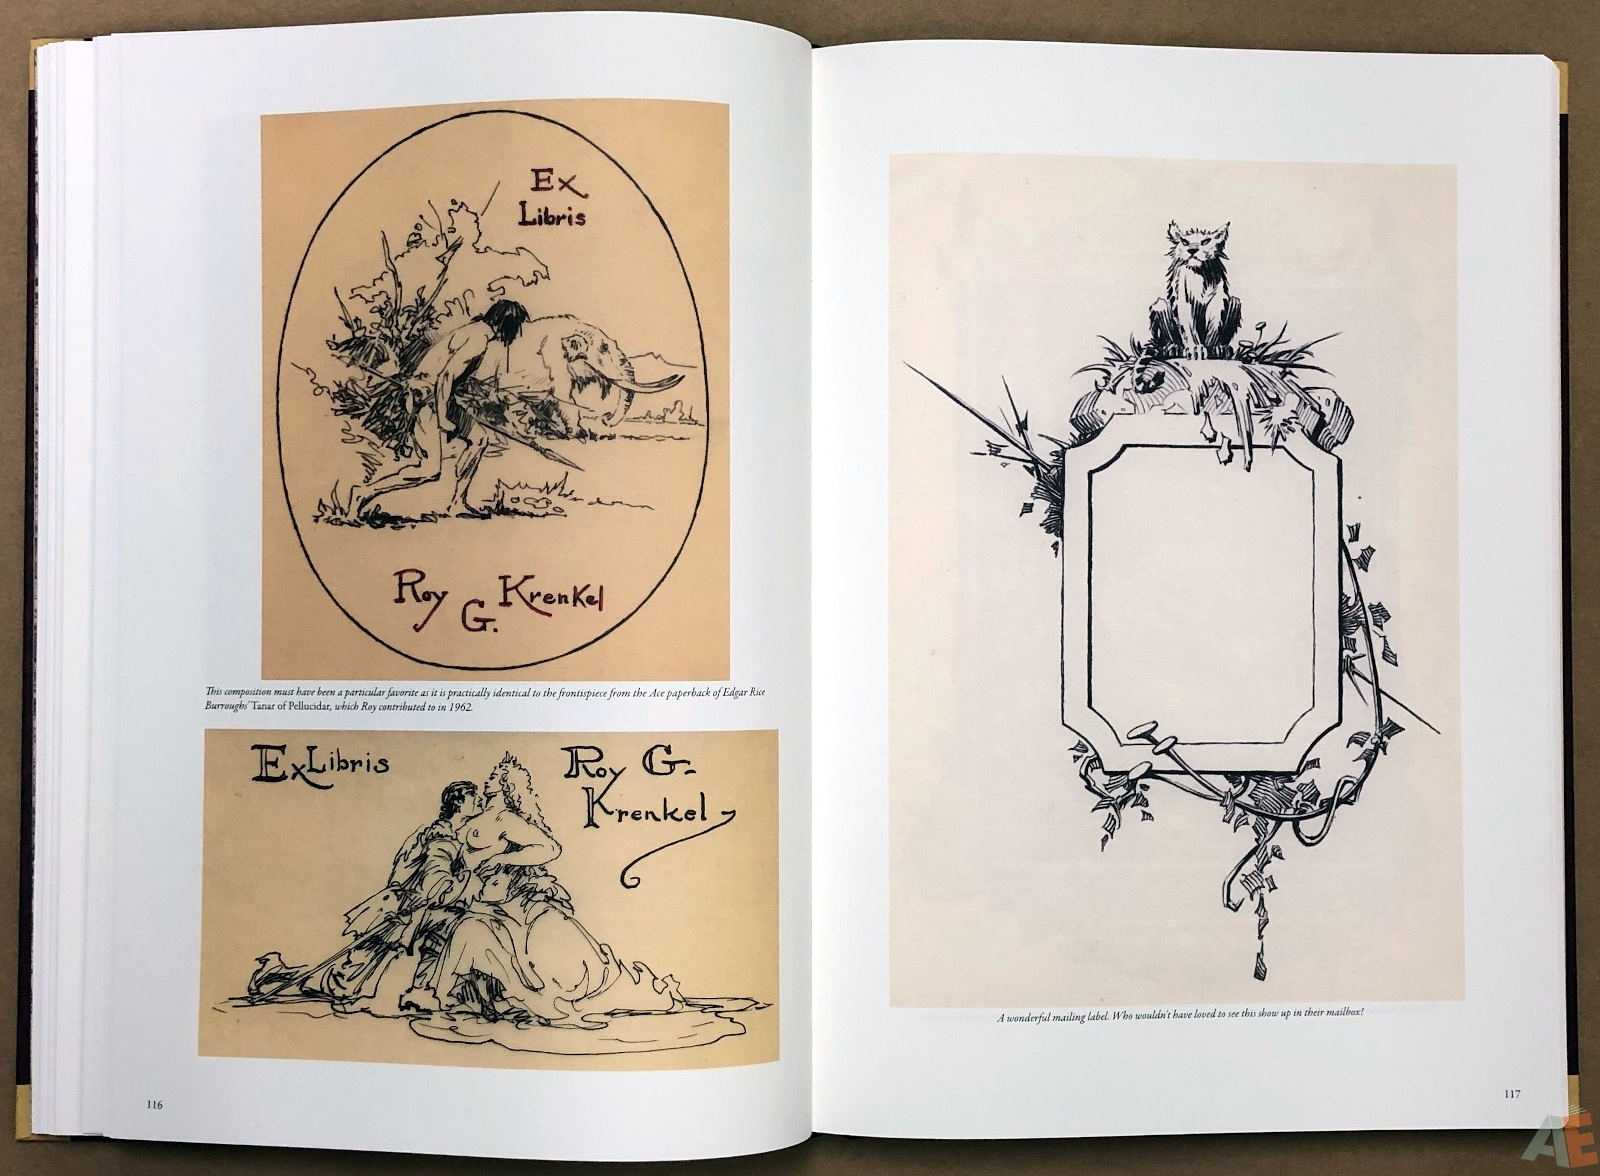 Roy G. Krenkel: Father of Heroic Fantasy - A Centennial Celebration 23